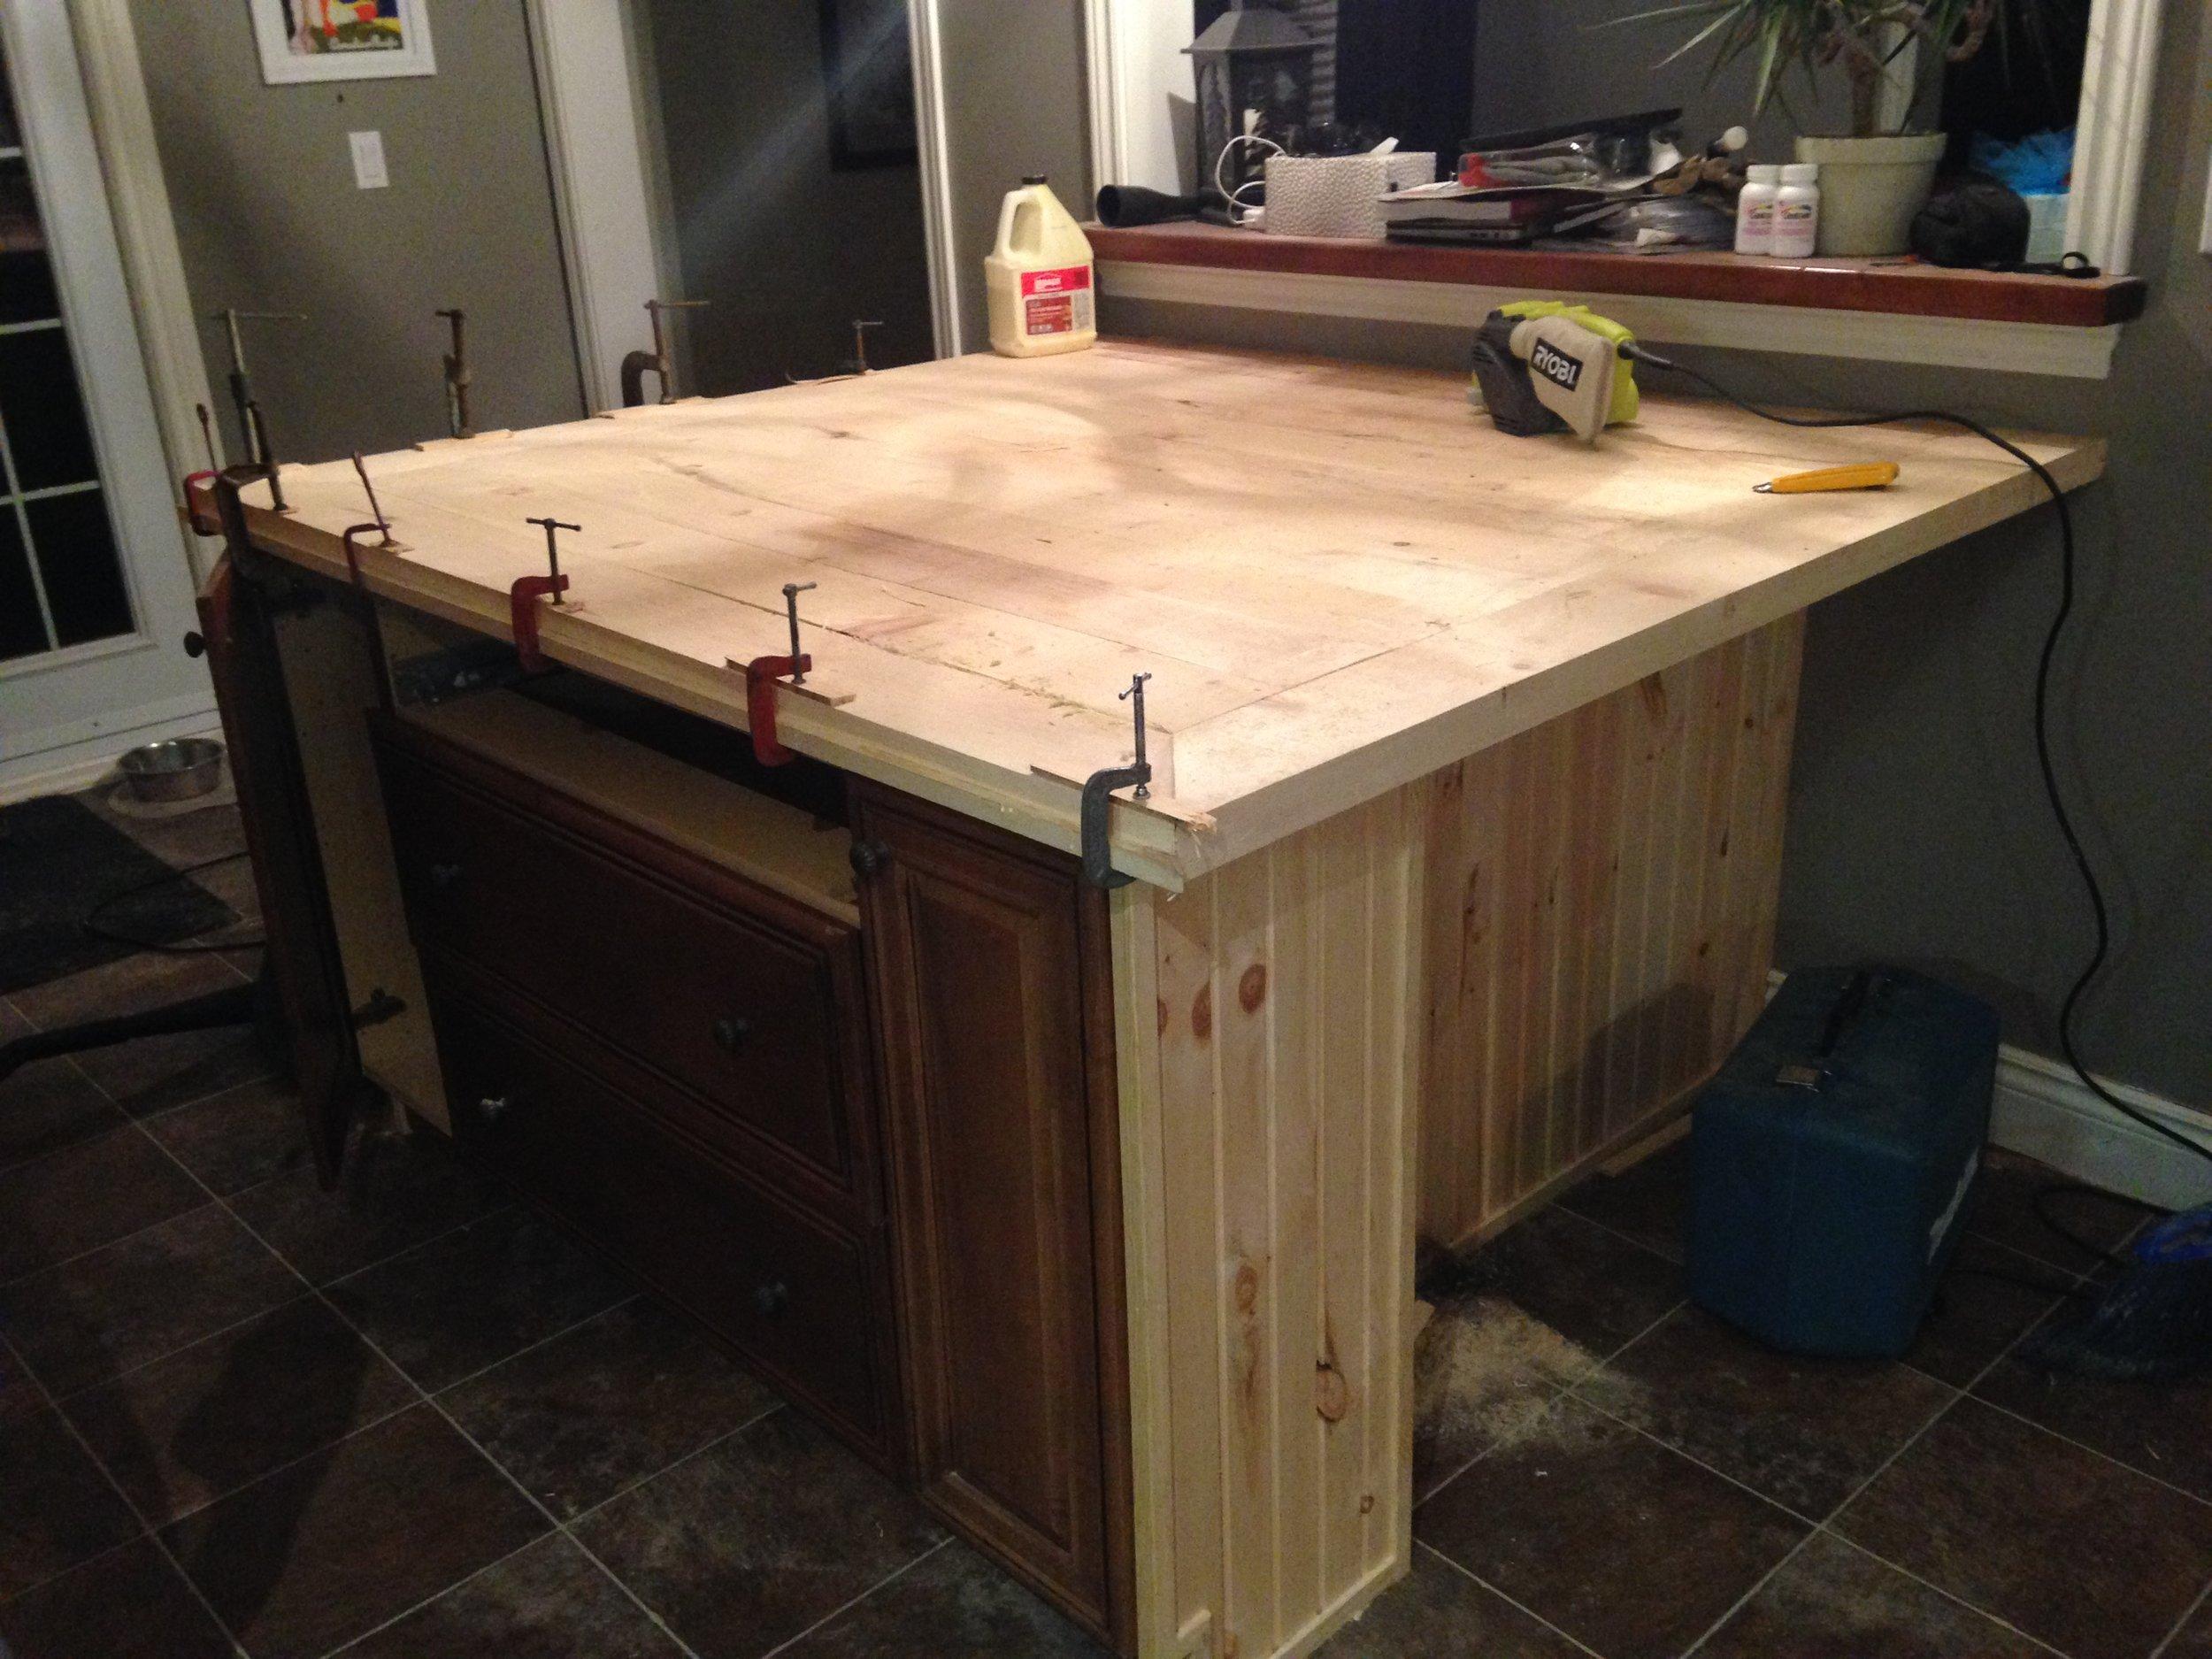 Trim and Baseboard on, Butcherblock Counter Setting